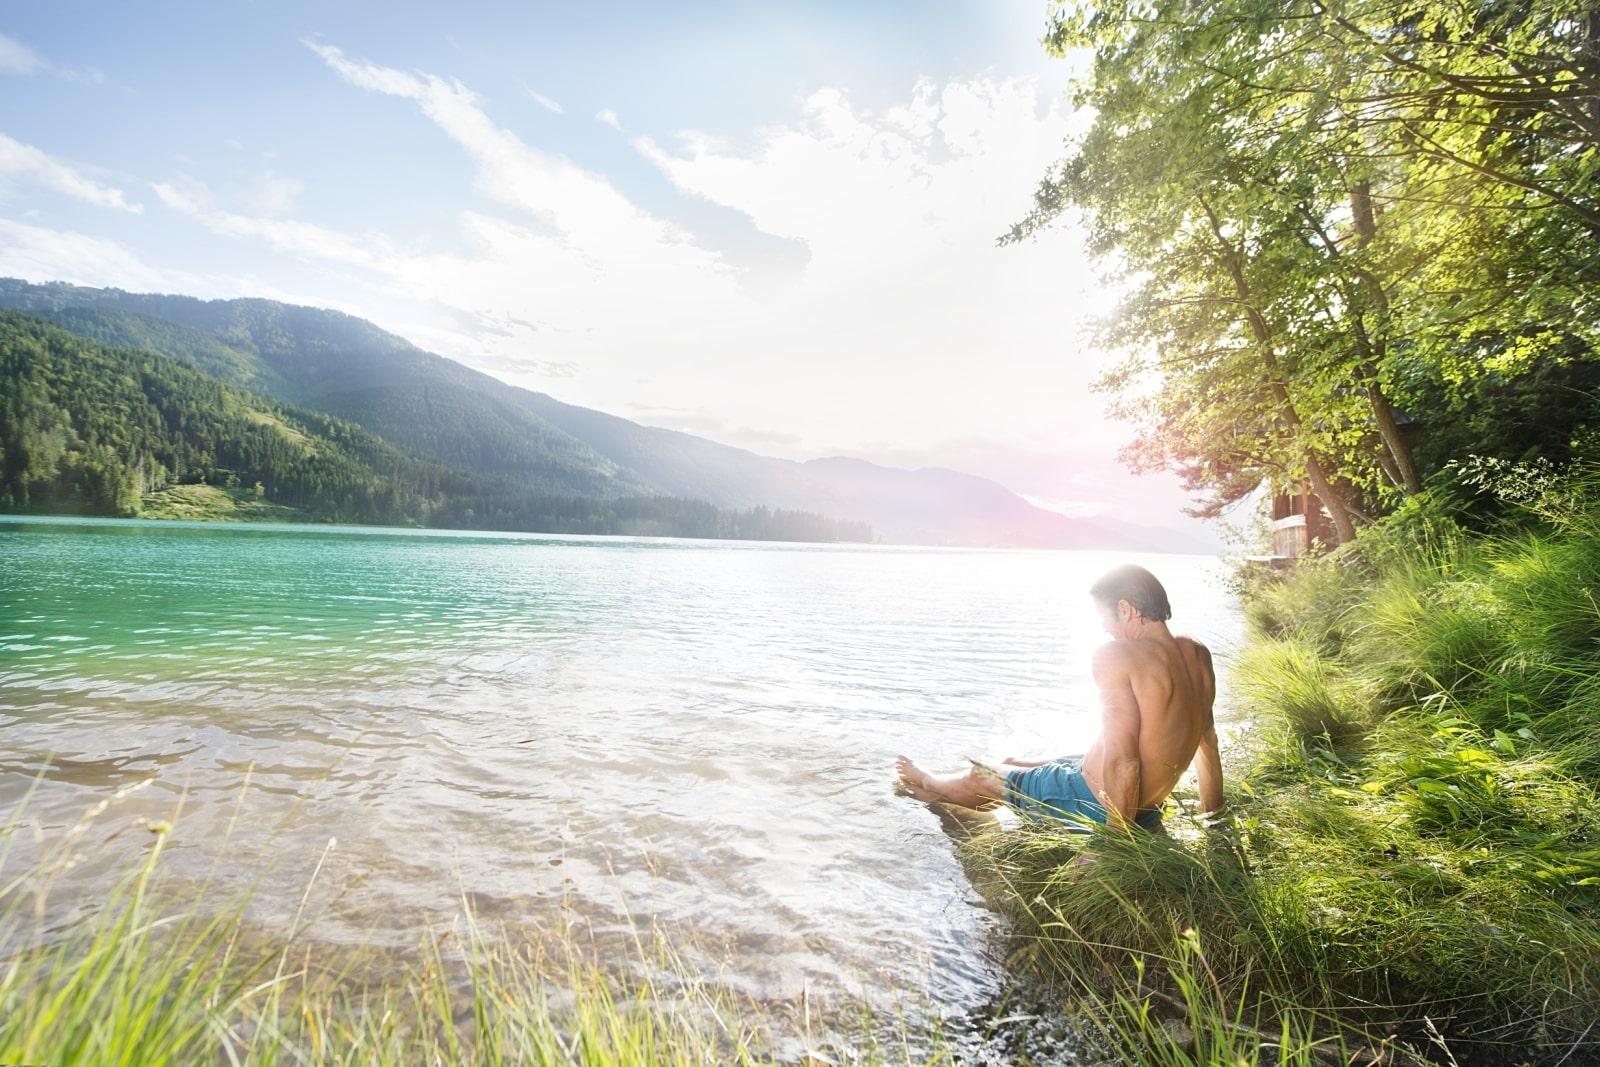 Heidi-Chalet-Falkert-Heidialm-Natur-See-Baden-Relaxen-Ufer